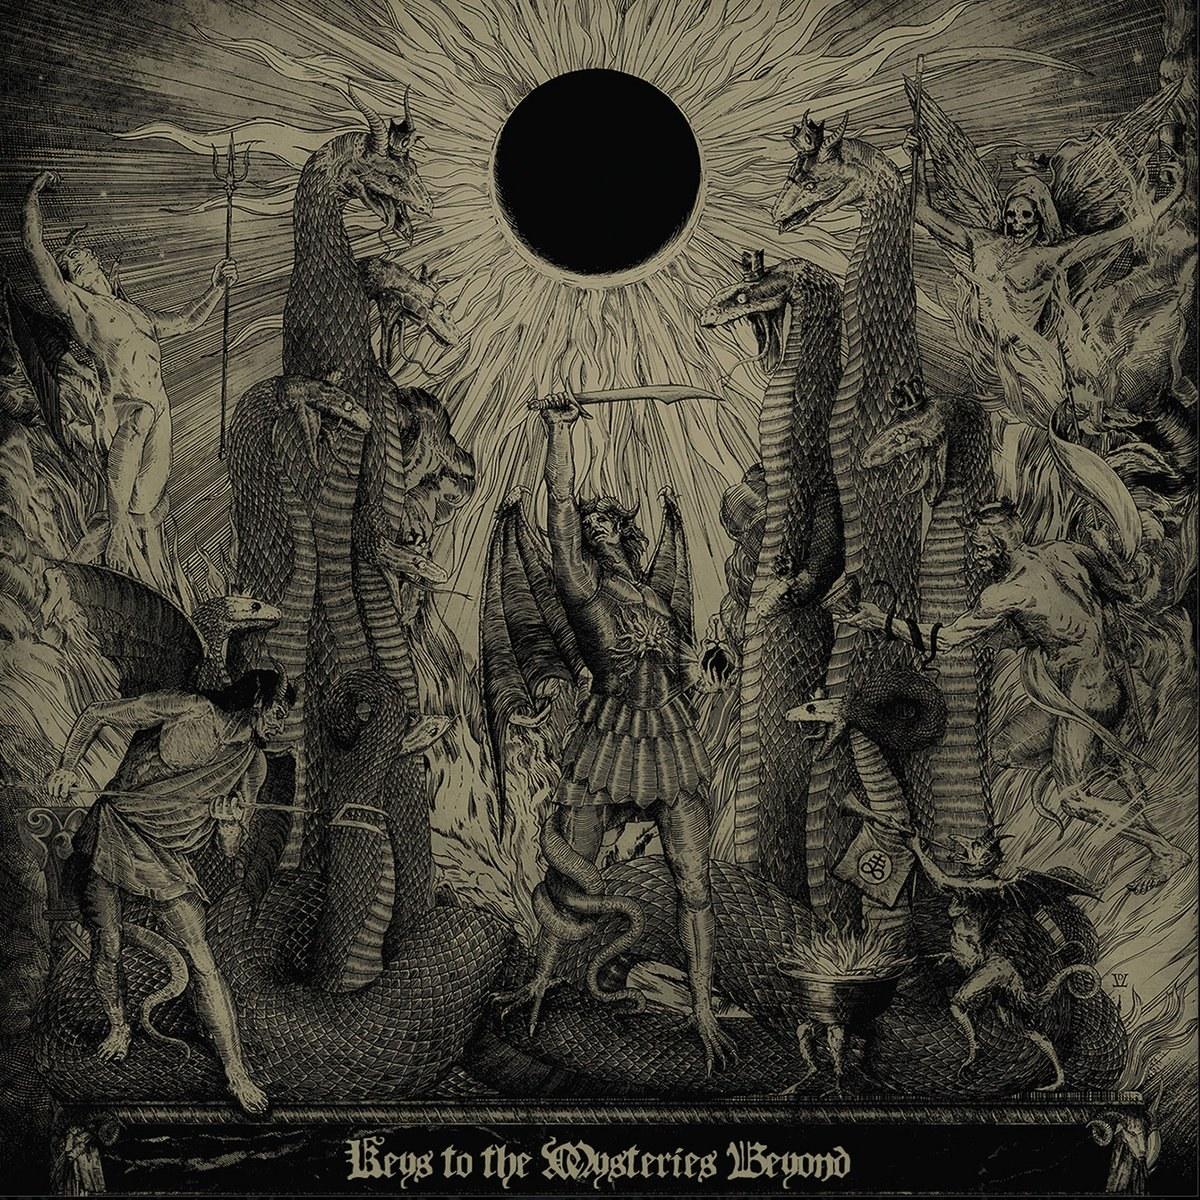 Grafvitnir - Keys to the Mysteries Beyond